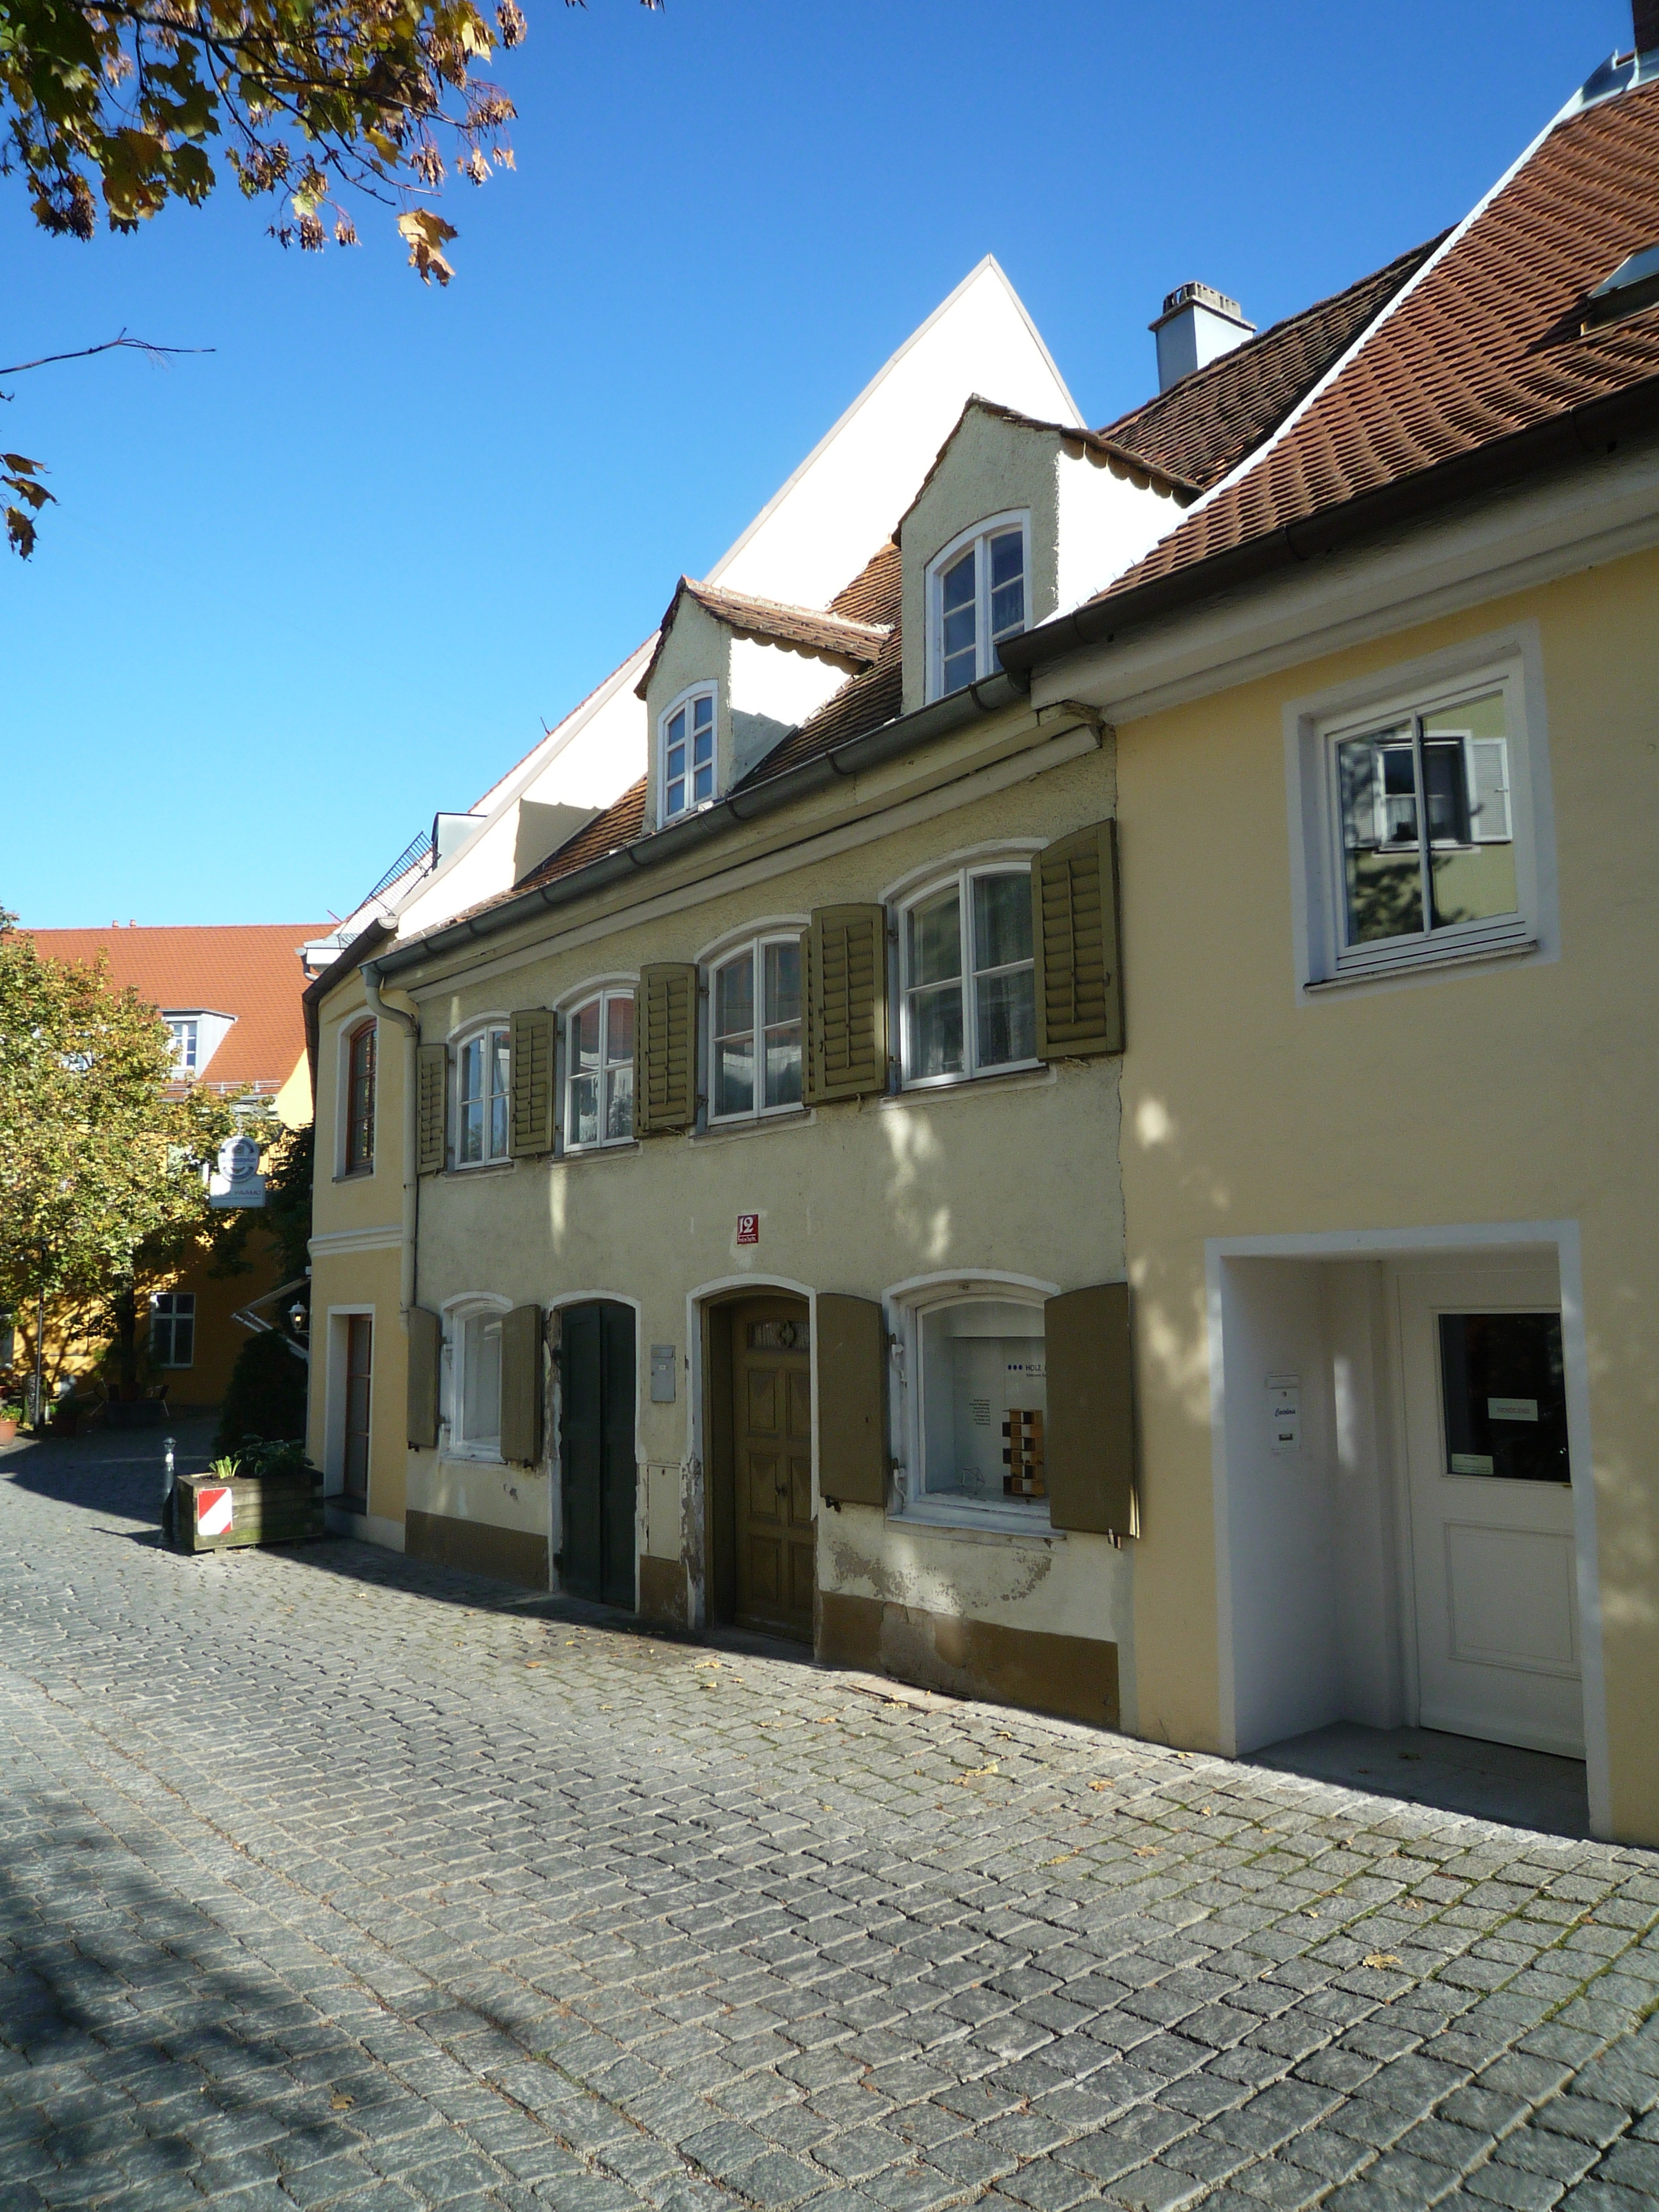 DateiGeneral-von-Nagel-Strau00dfe 12 (Freising).jpg U2013 Wikipedia